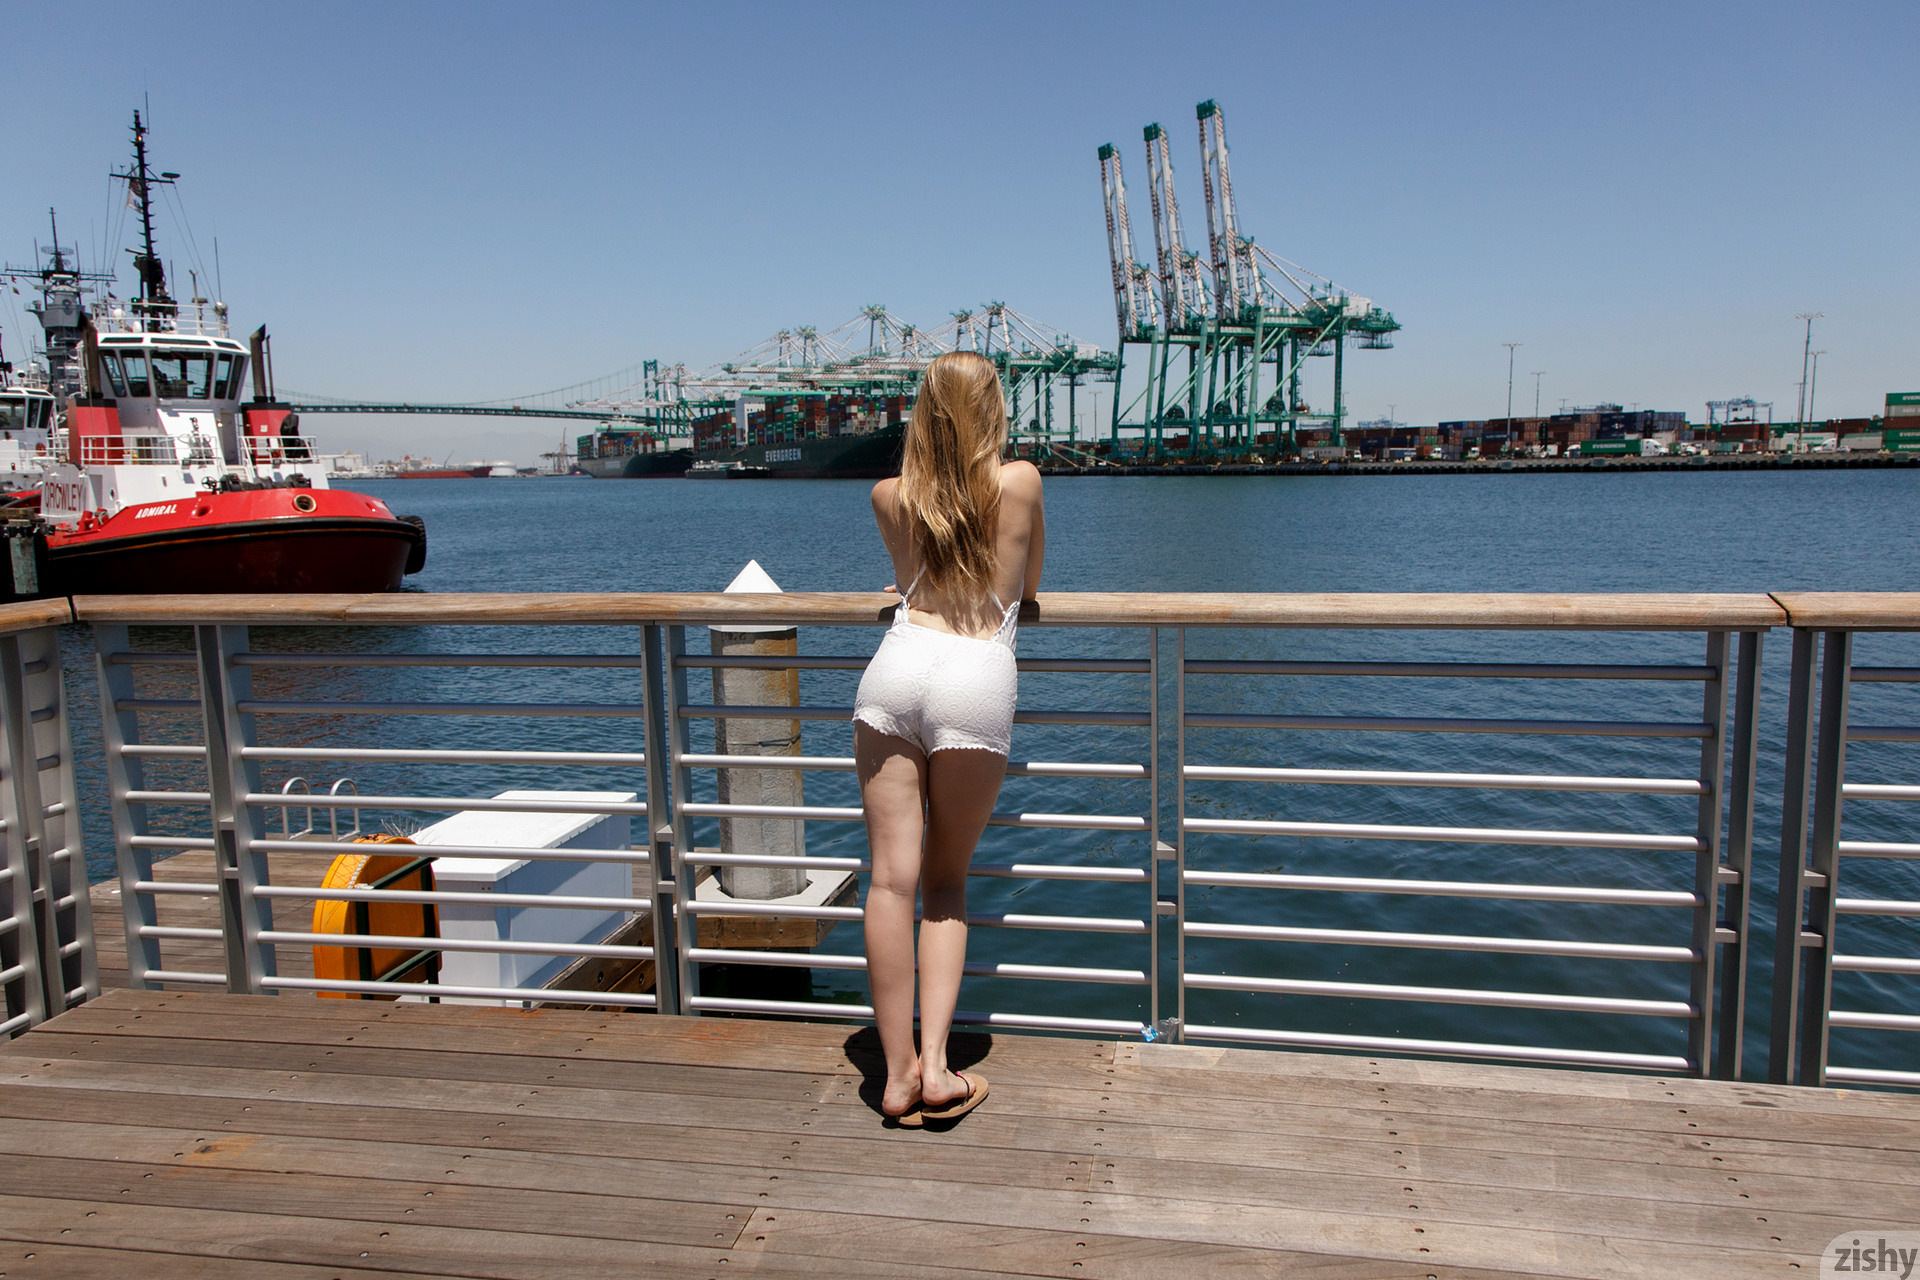 Ashley Lane Terminal Island Zishy (31)